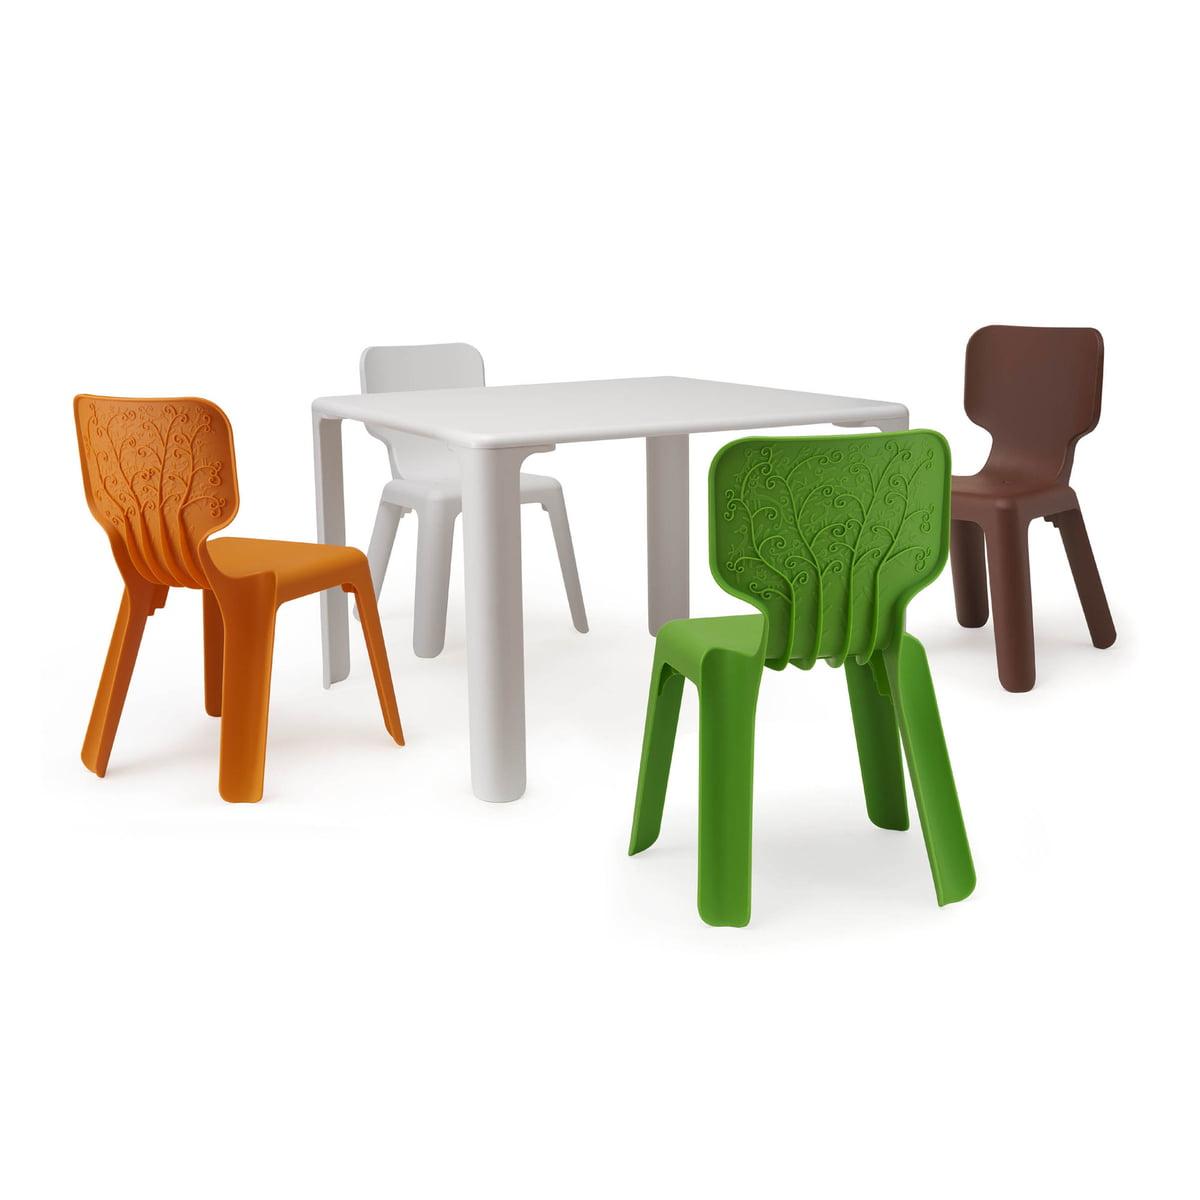 Kinderstuhl Und Tisch alma kinderstuhl magis me shop